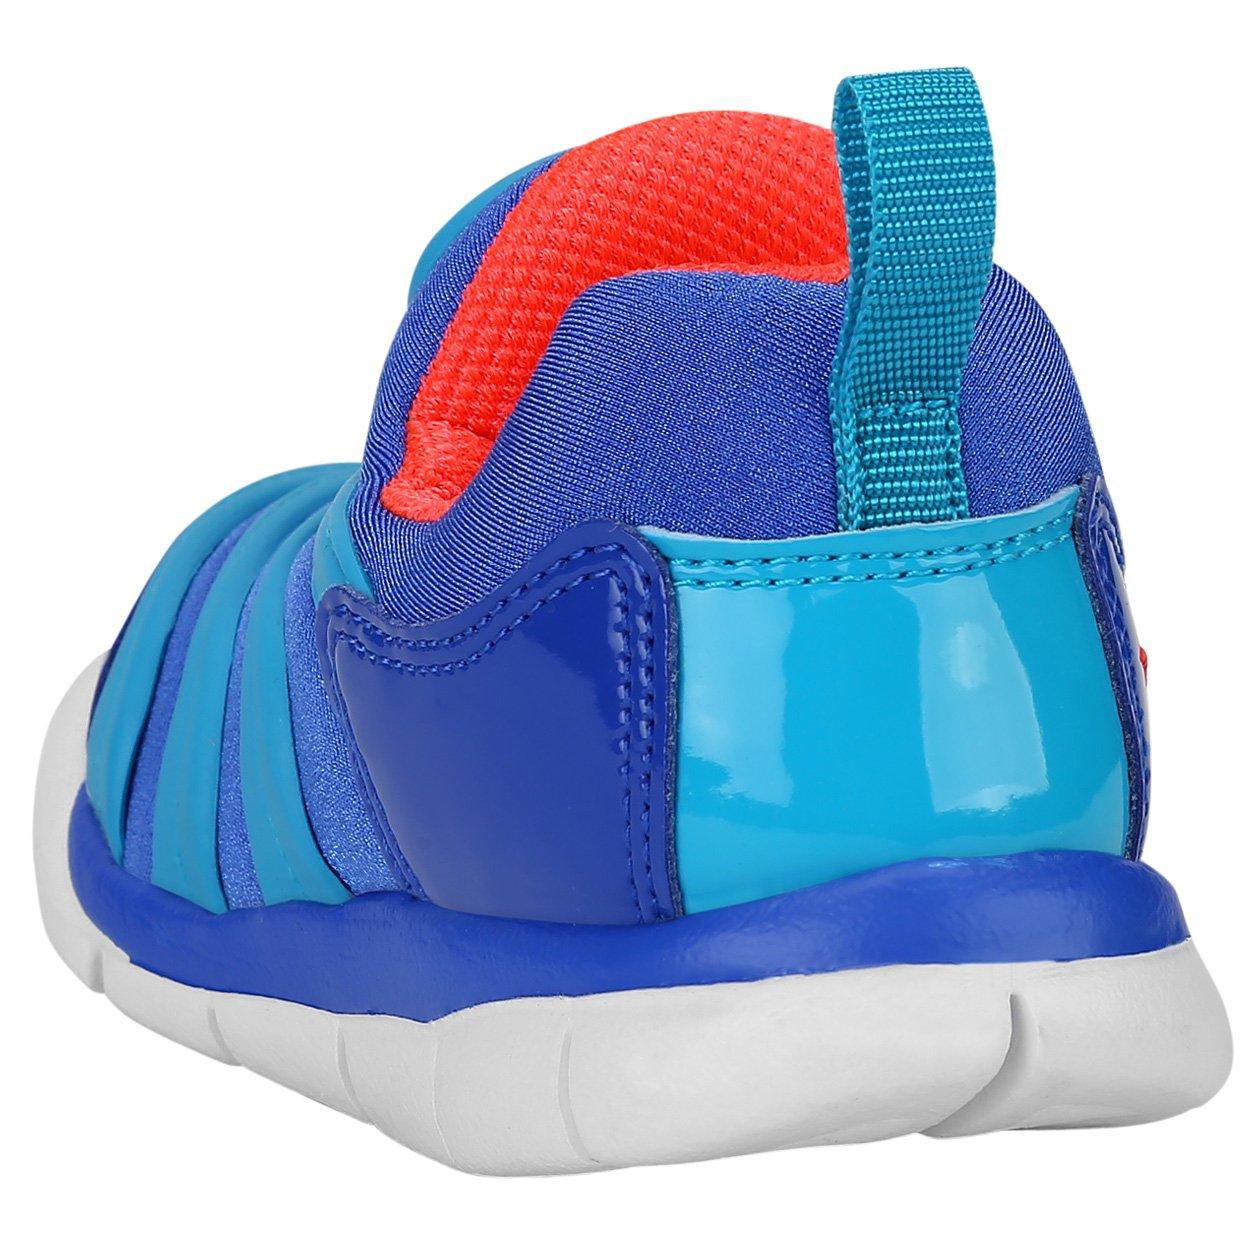 df2ea24fe Tênis Infantil Nike Dynamo Free - Azul e Laranja - Compre Agora ...